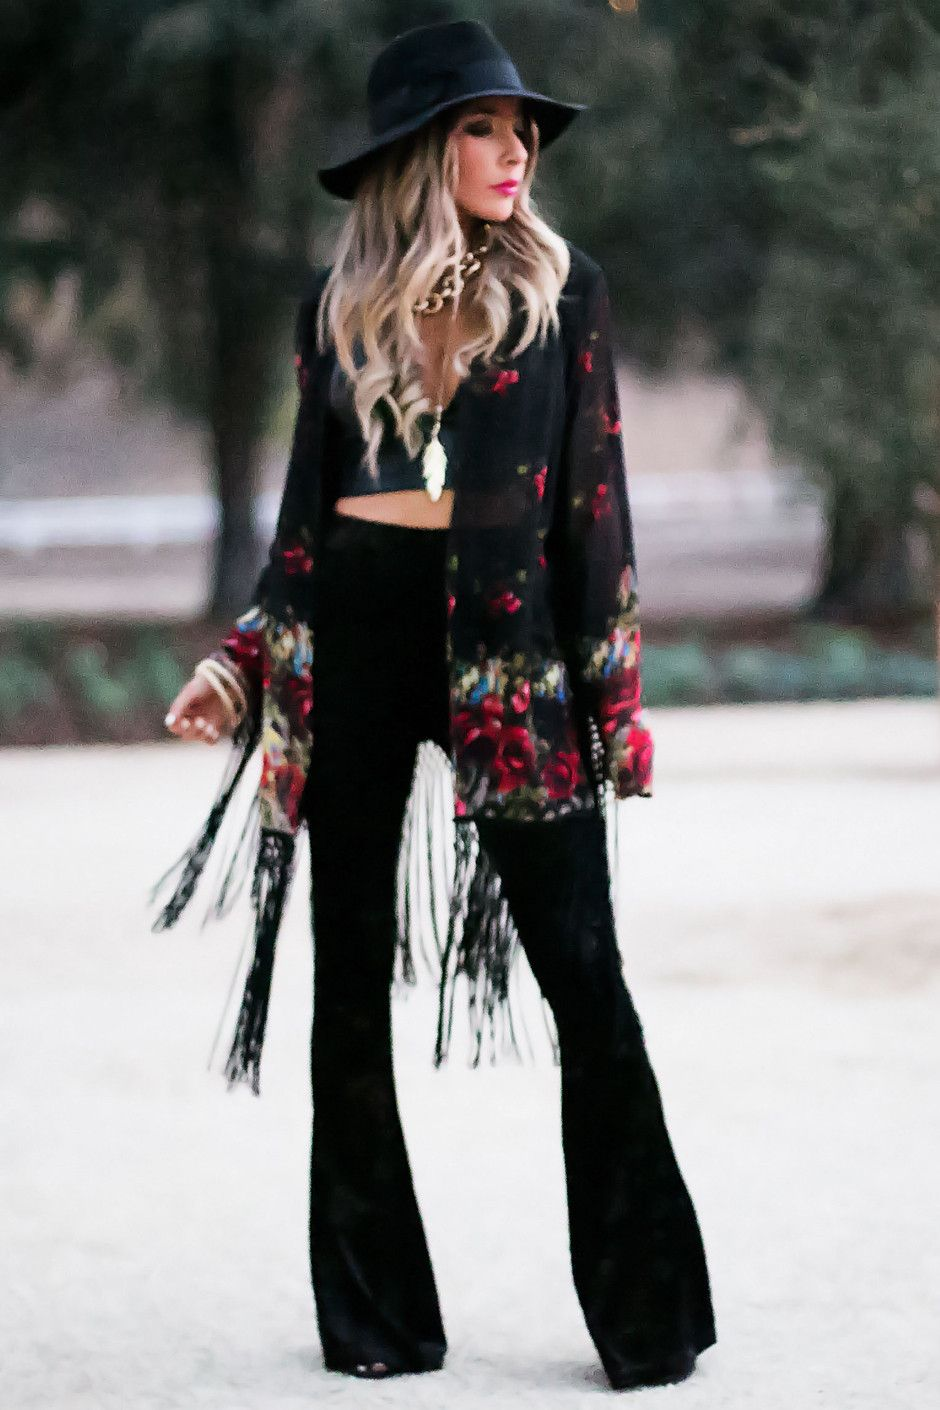 Winter Boho Pants Outfit